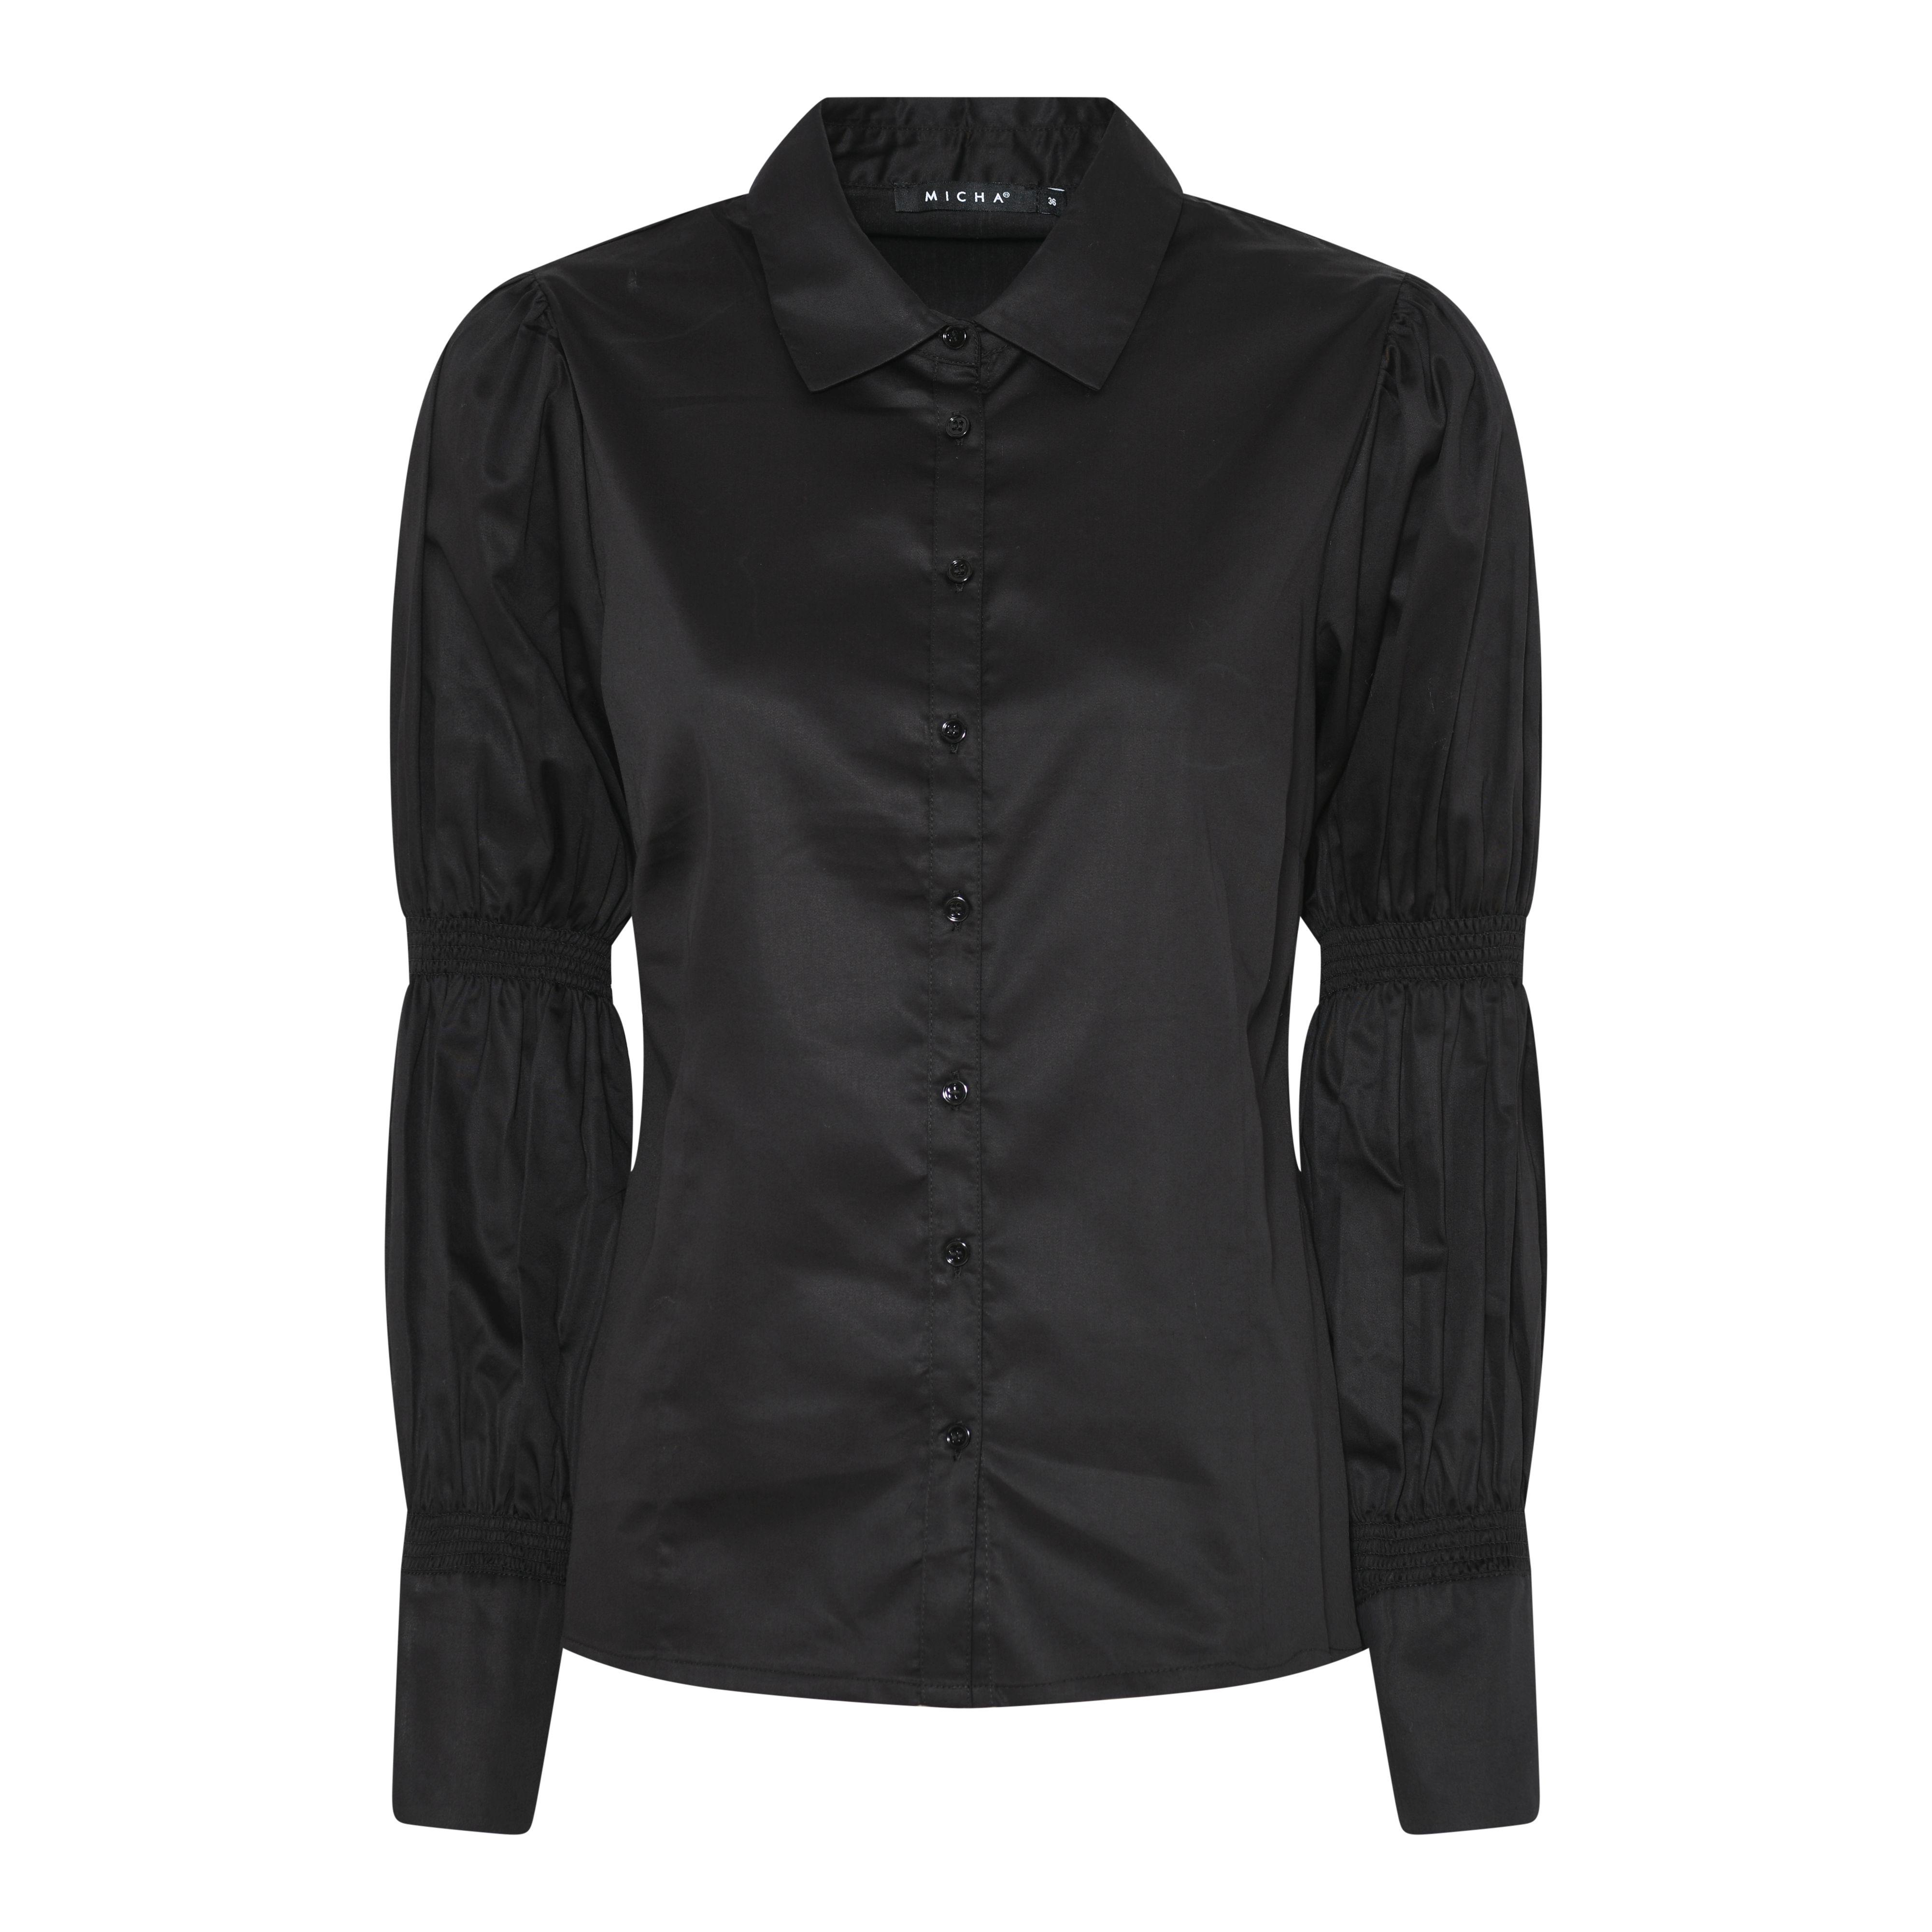 Micha skjorte, Sort, 48